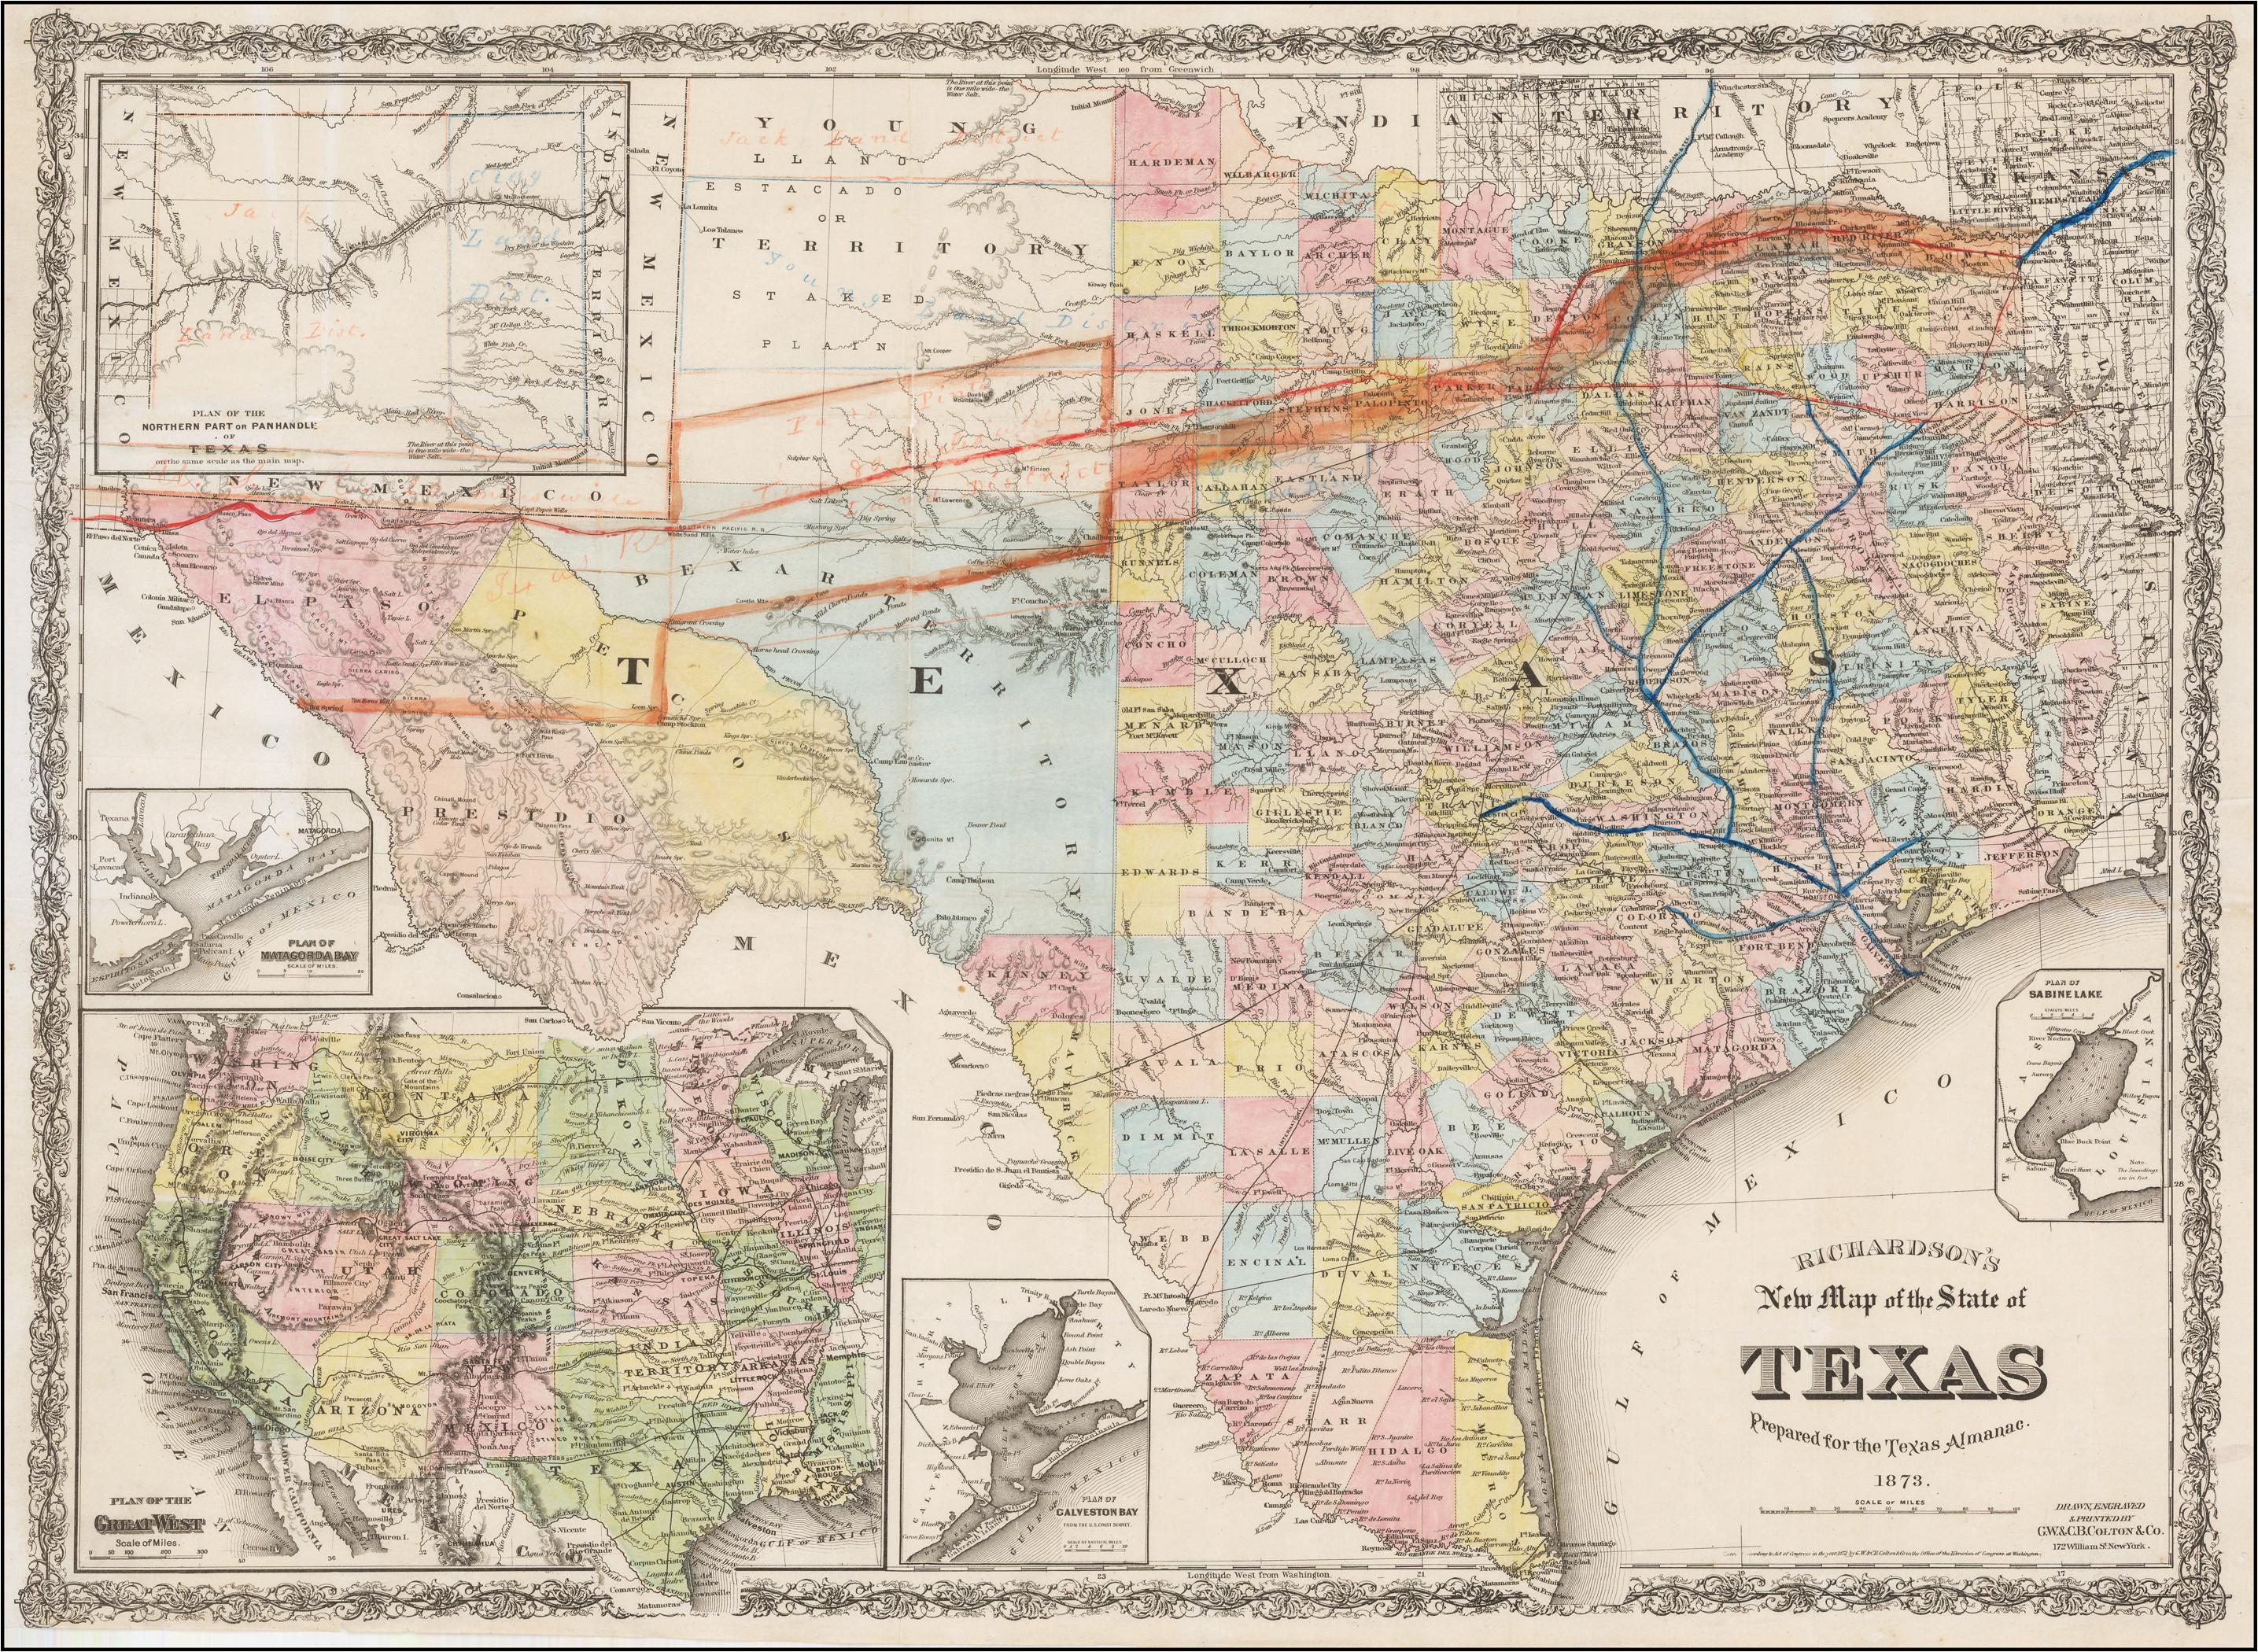 Map Of Texas New Mexico.Map Richardson Texas Map Of New Mexico And Texas Beautiful Map Of